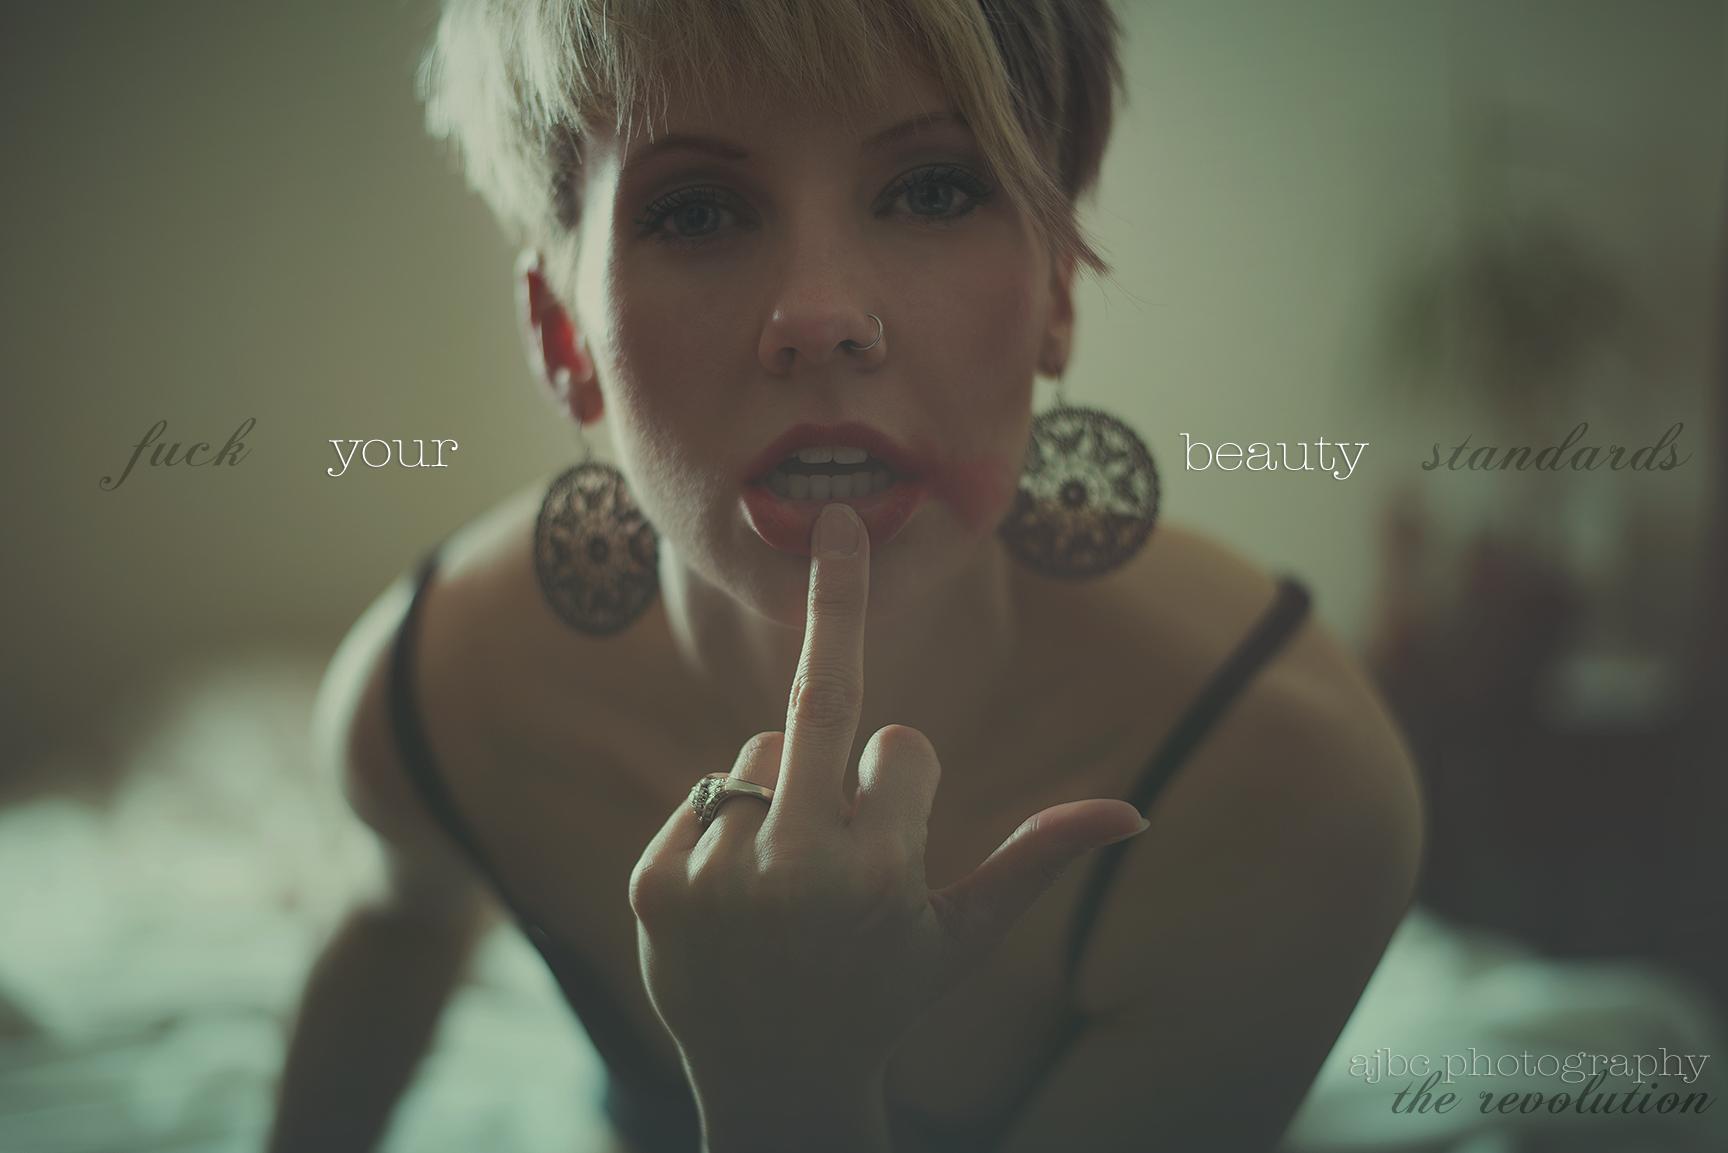 AJBC Photography Port Huron Michigan Boudoir Beauty Photographer Empowerment Women